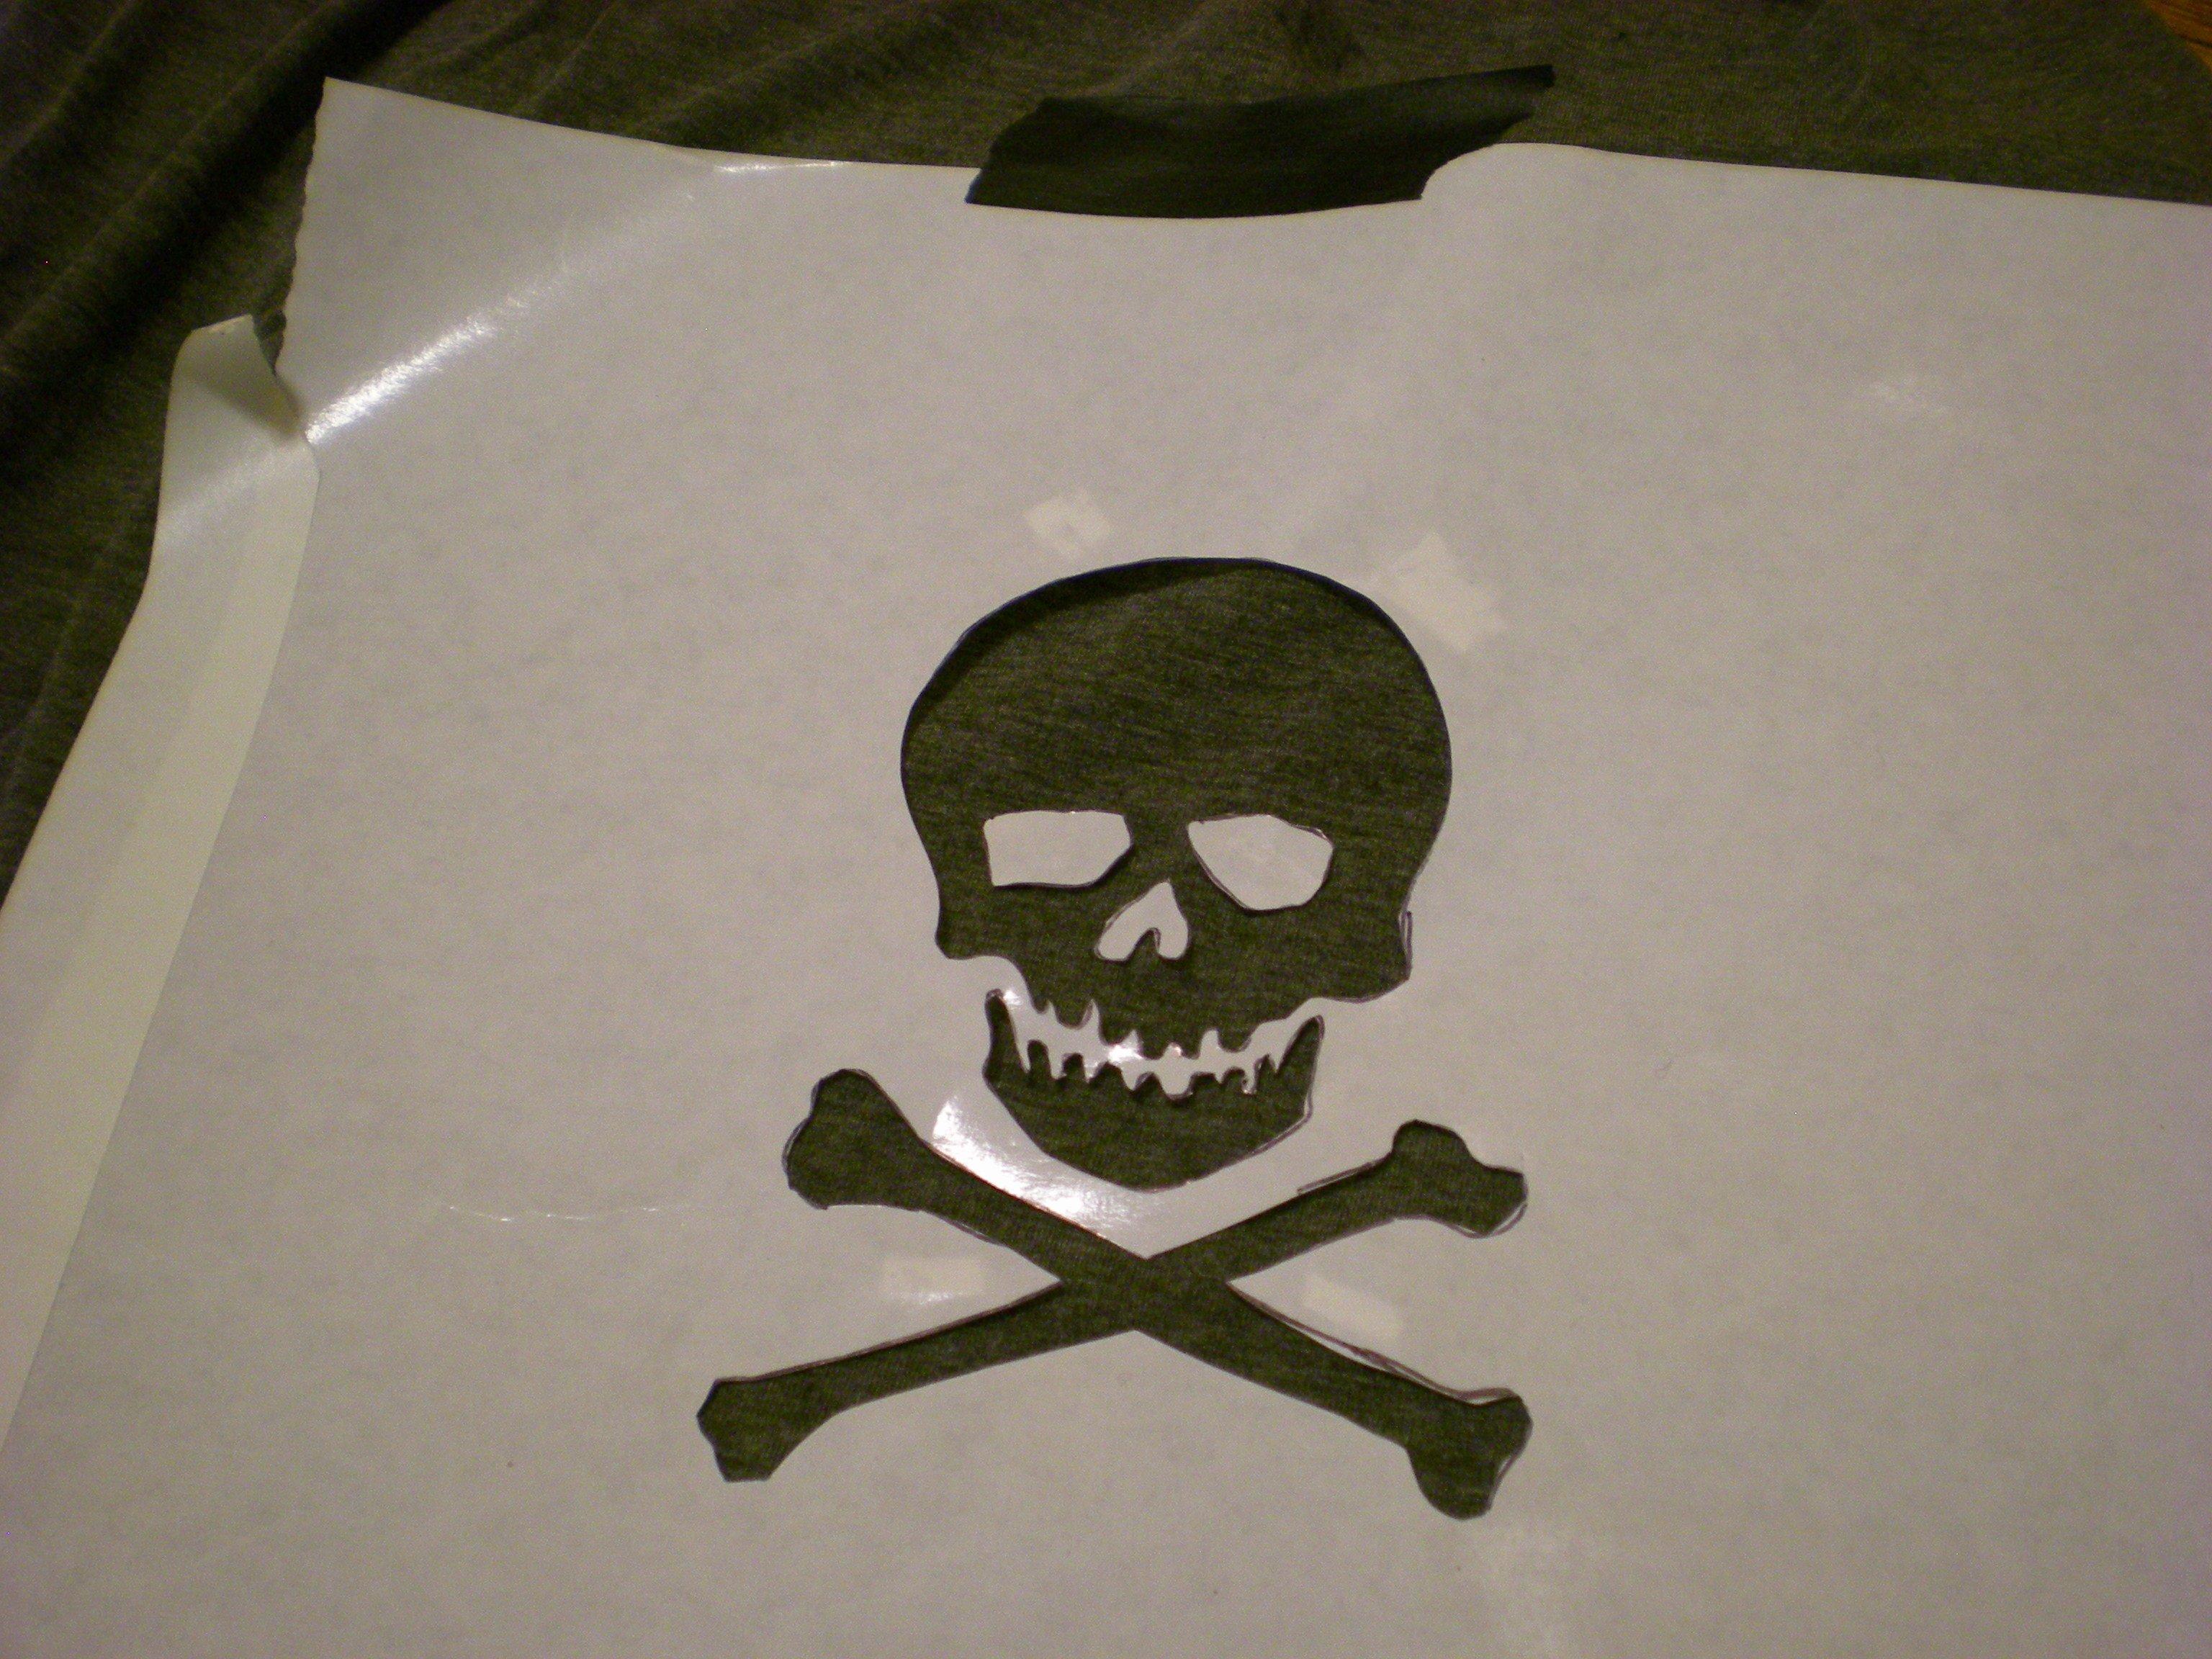 Skull Stencils for Spray Painting Best Of Ilovetocreate Blog 4 Ways to Spray